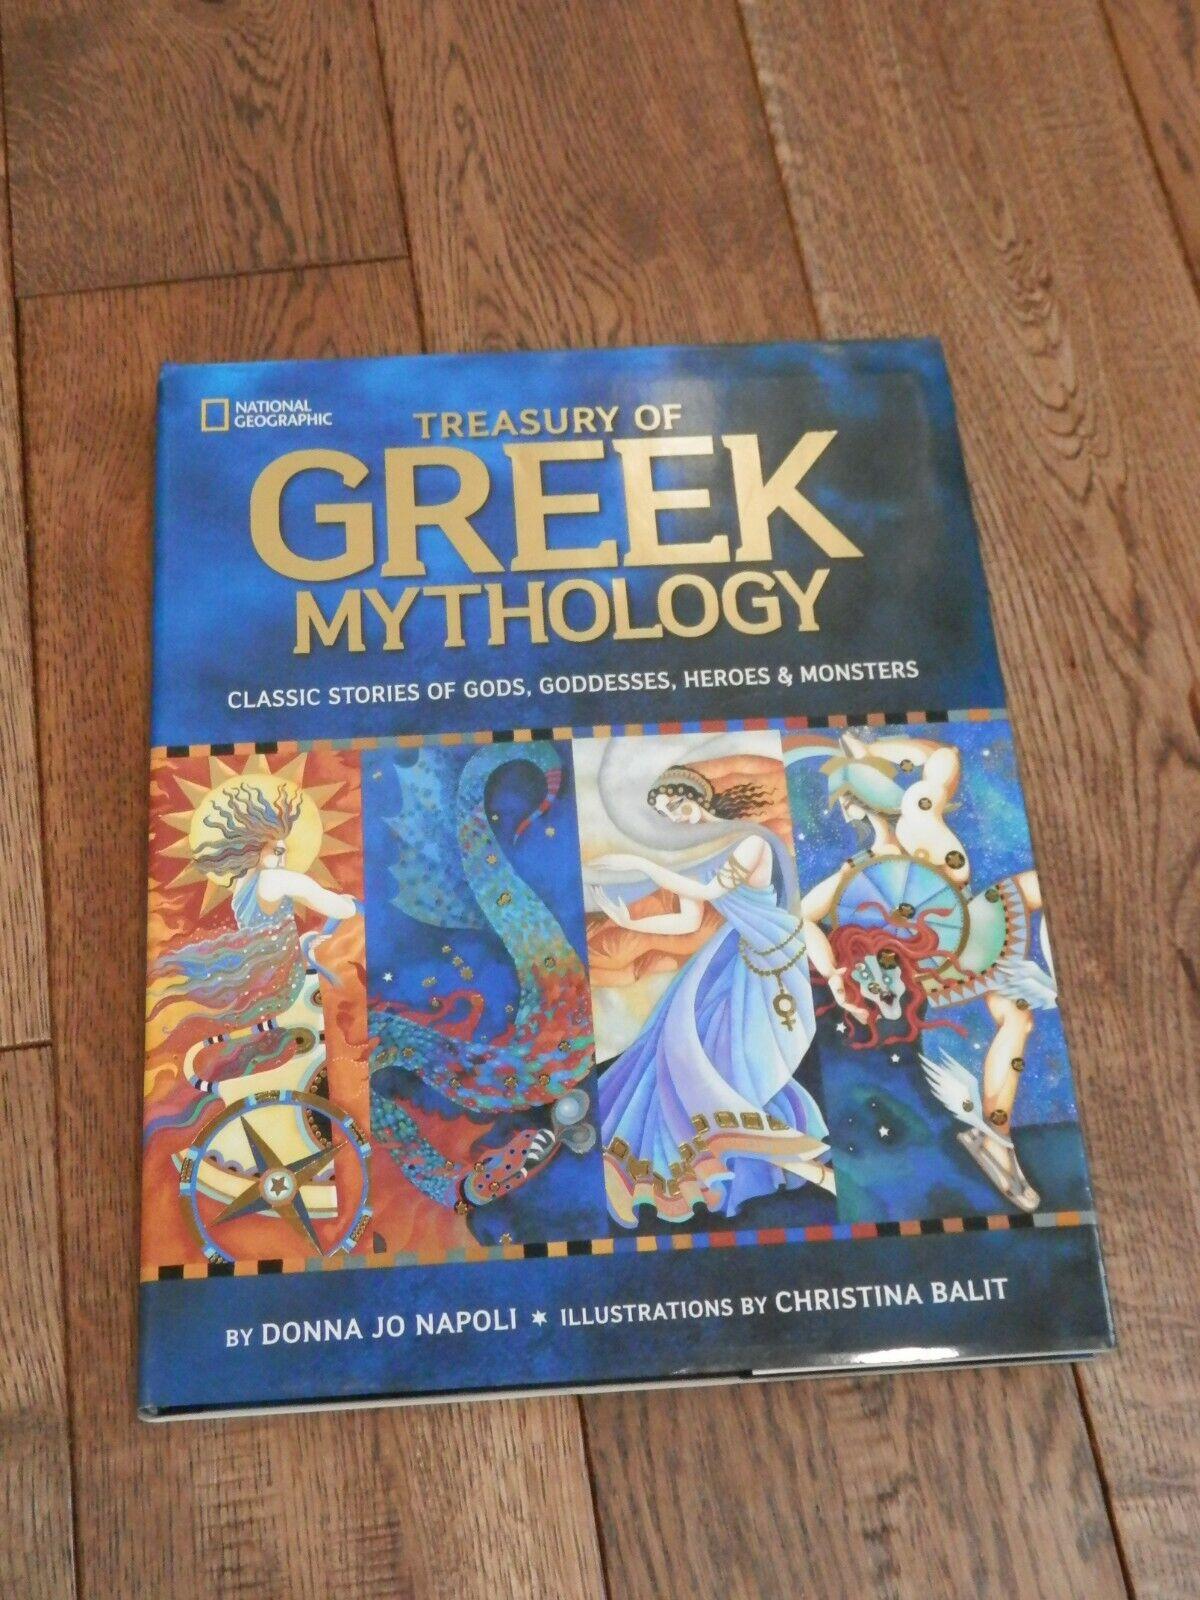 90's Porn Film Medusa Goddess treasury of greek mythology : classic stories of gods, goddesses, heroes  and monstersdonna jo napoli and national geographic kids staff (2011,